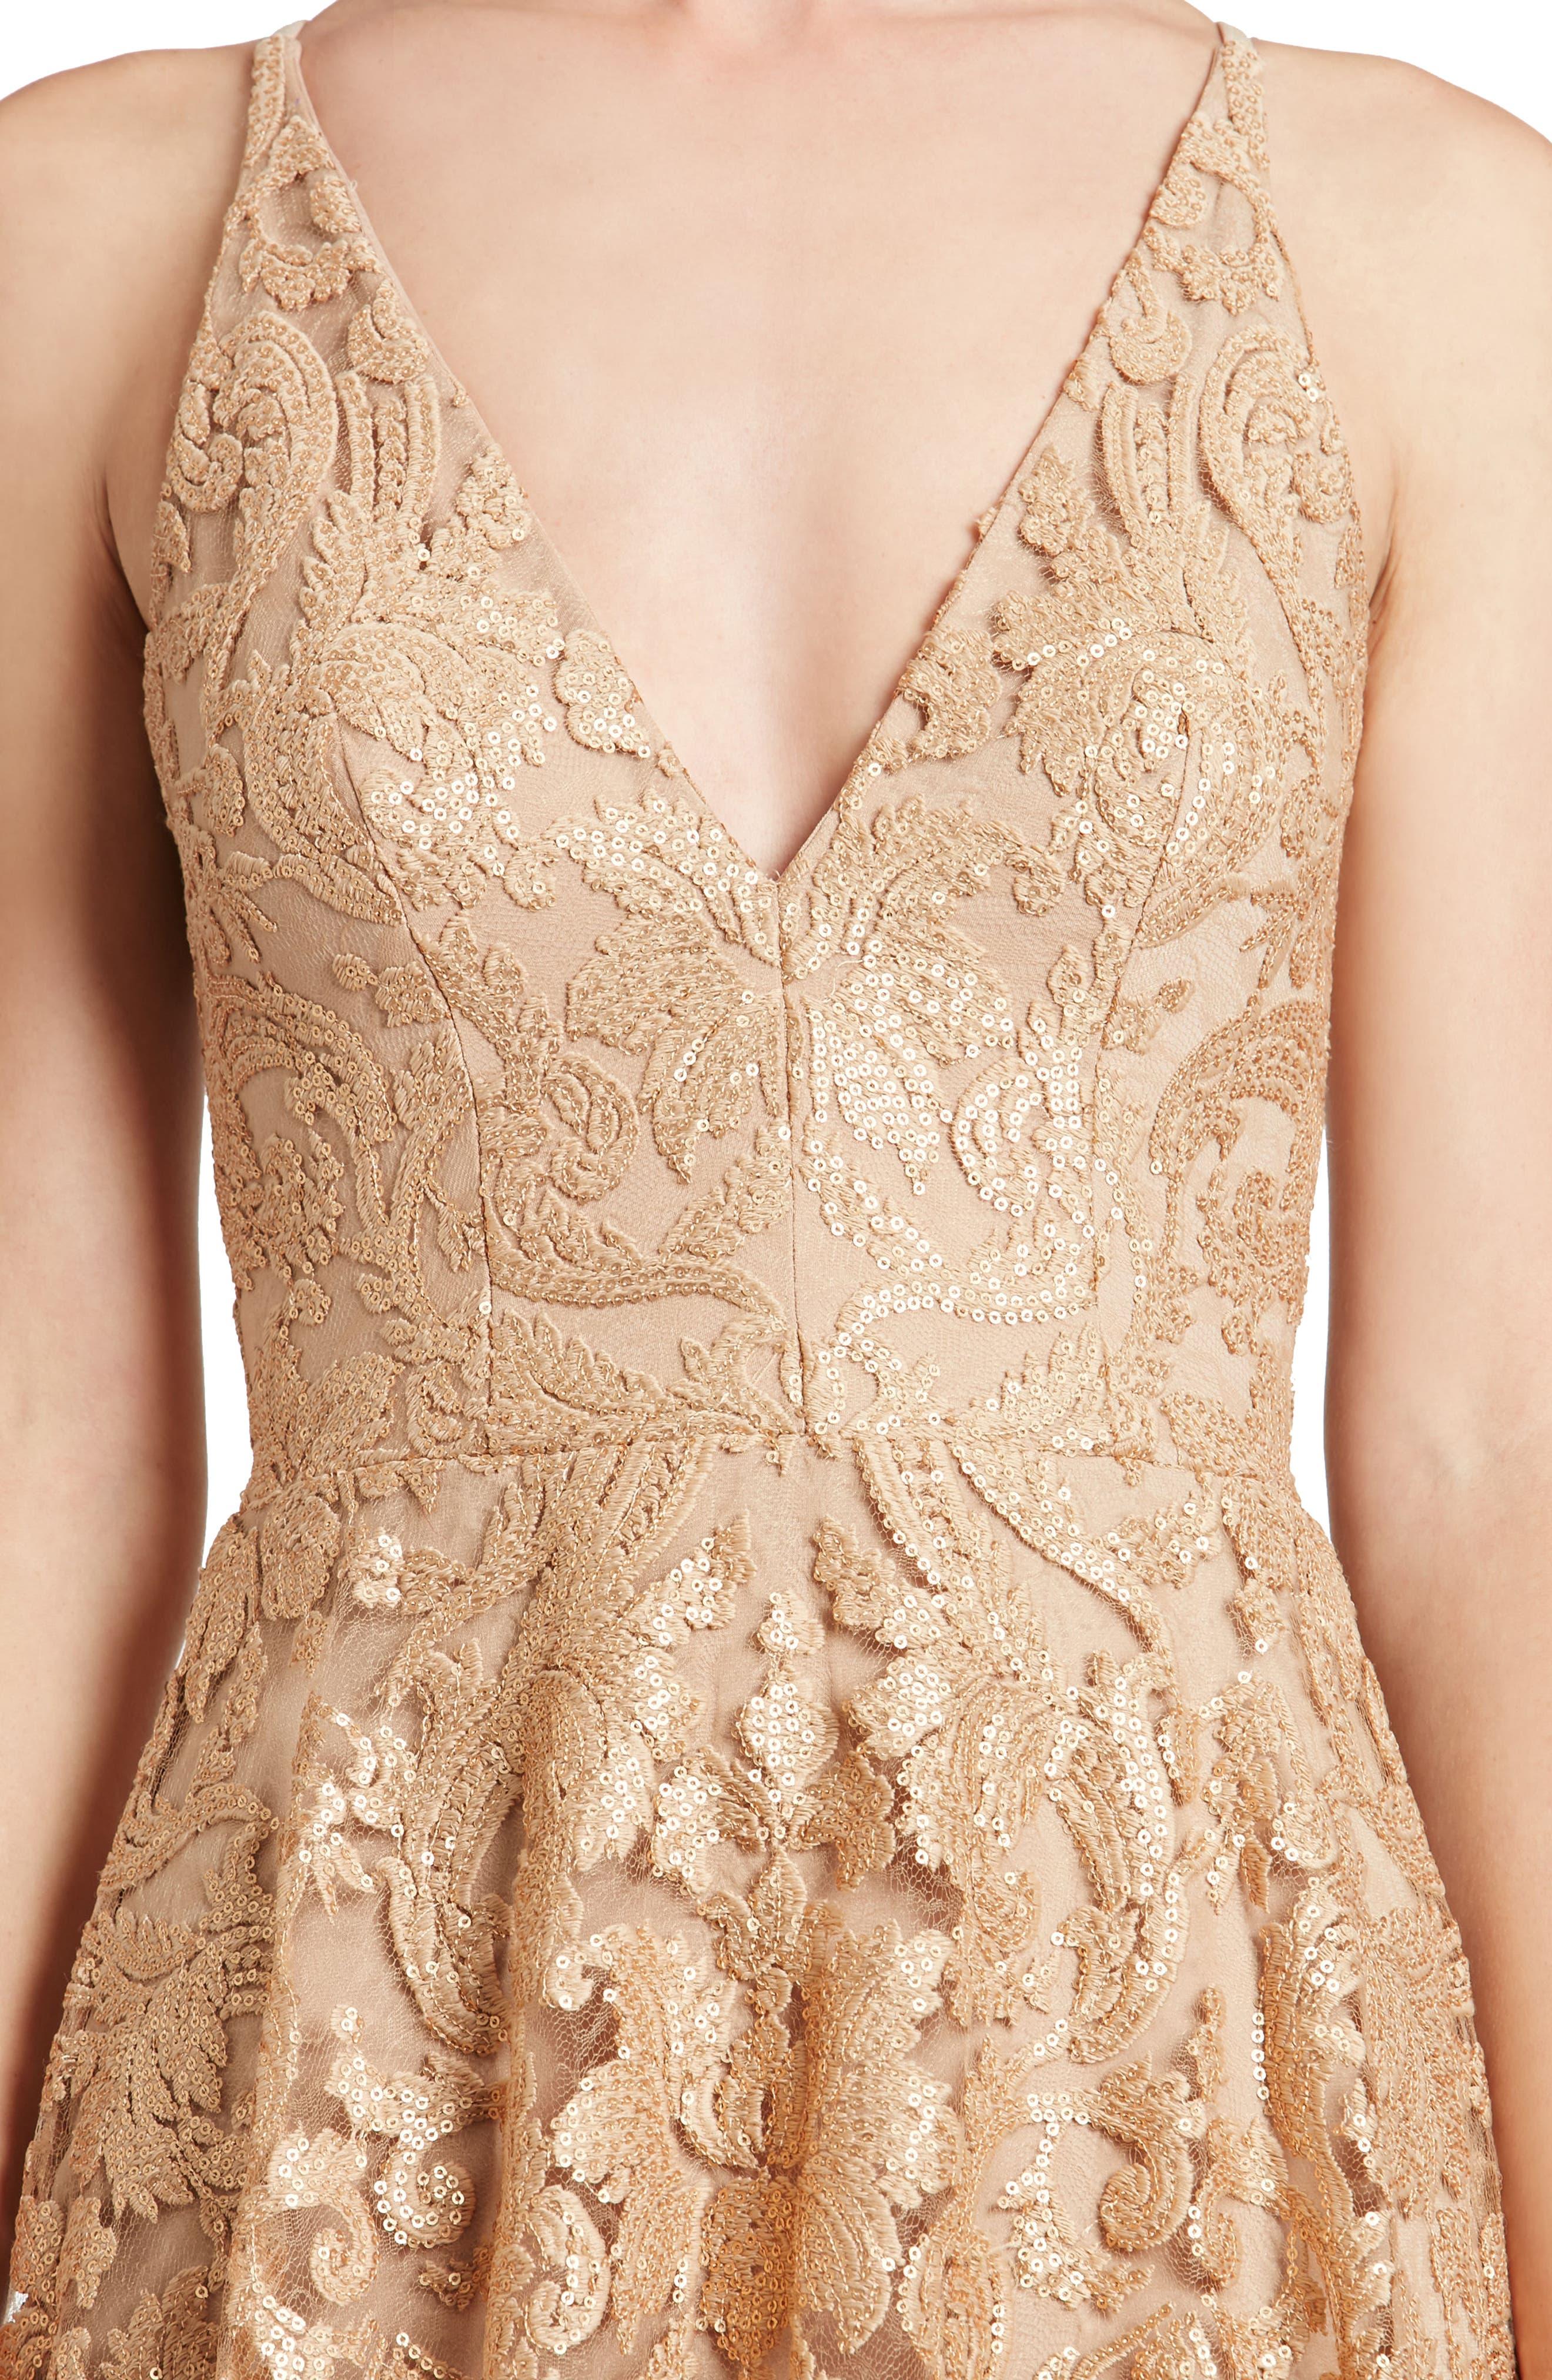 Blair Embellished Fit & Flare Dress,                             Alternate thumbnail 28, color,